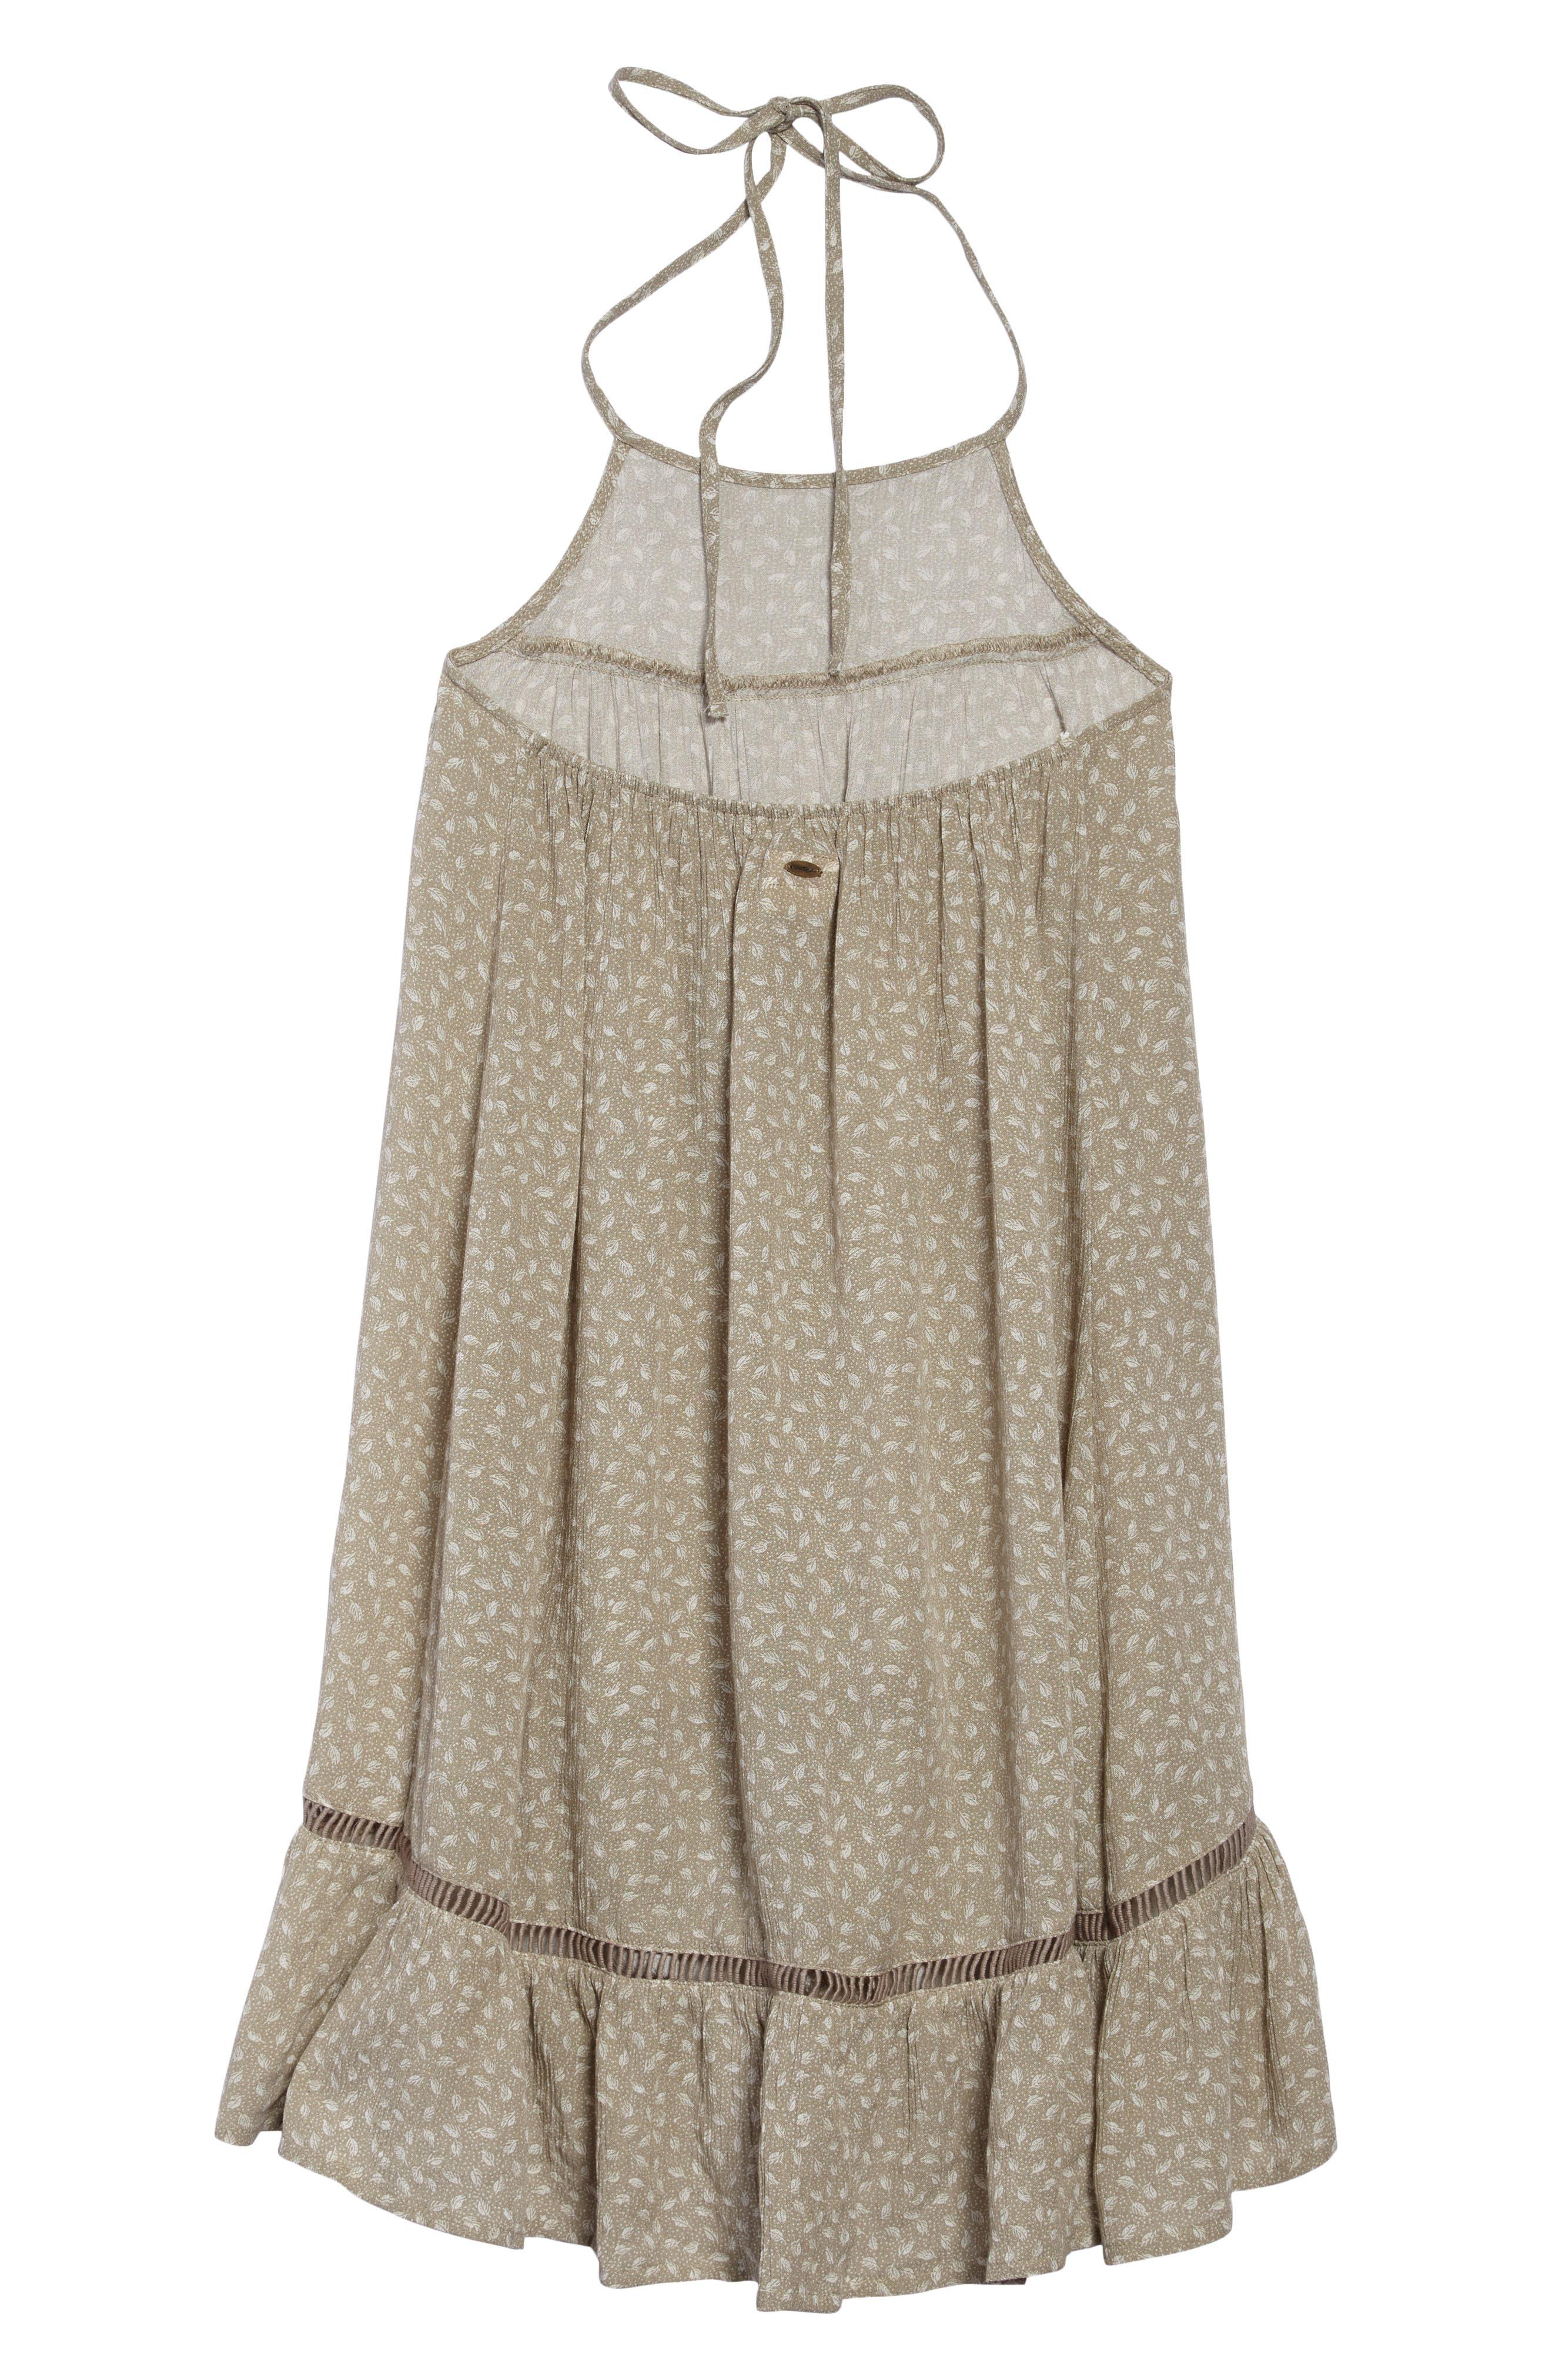 Danielle Ruffle Halter Dress,                             Alternate thumbnail 2, color,                             Laurel Oak